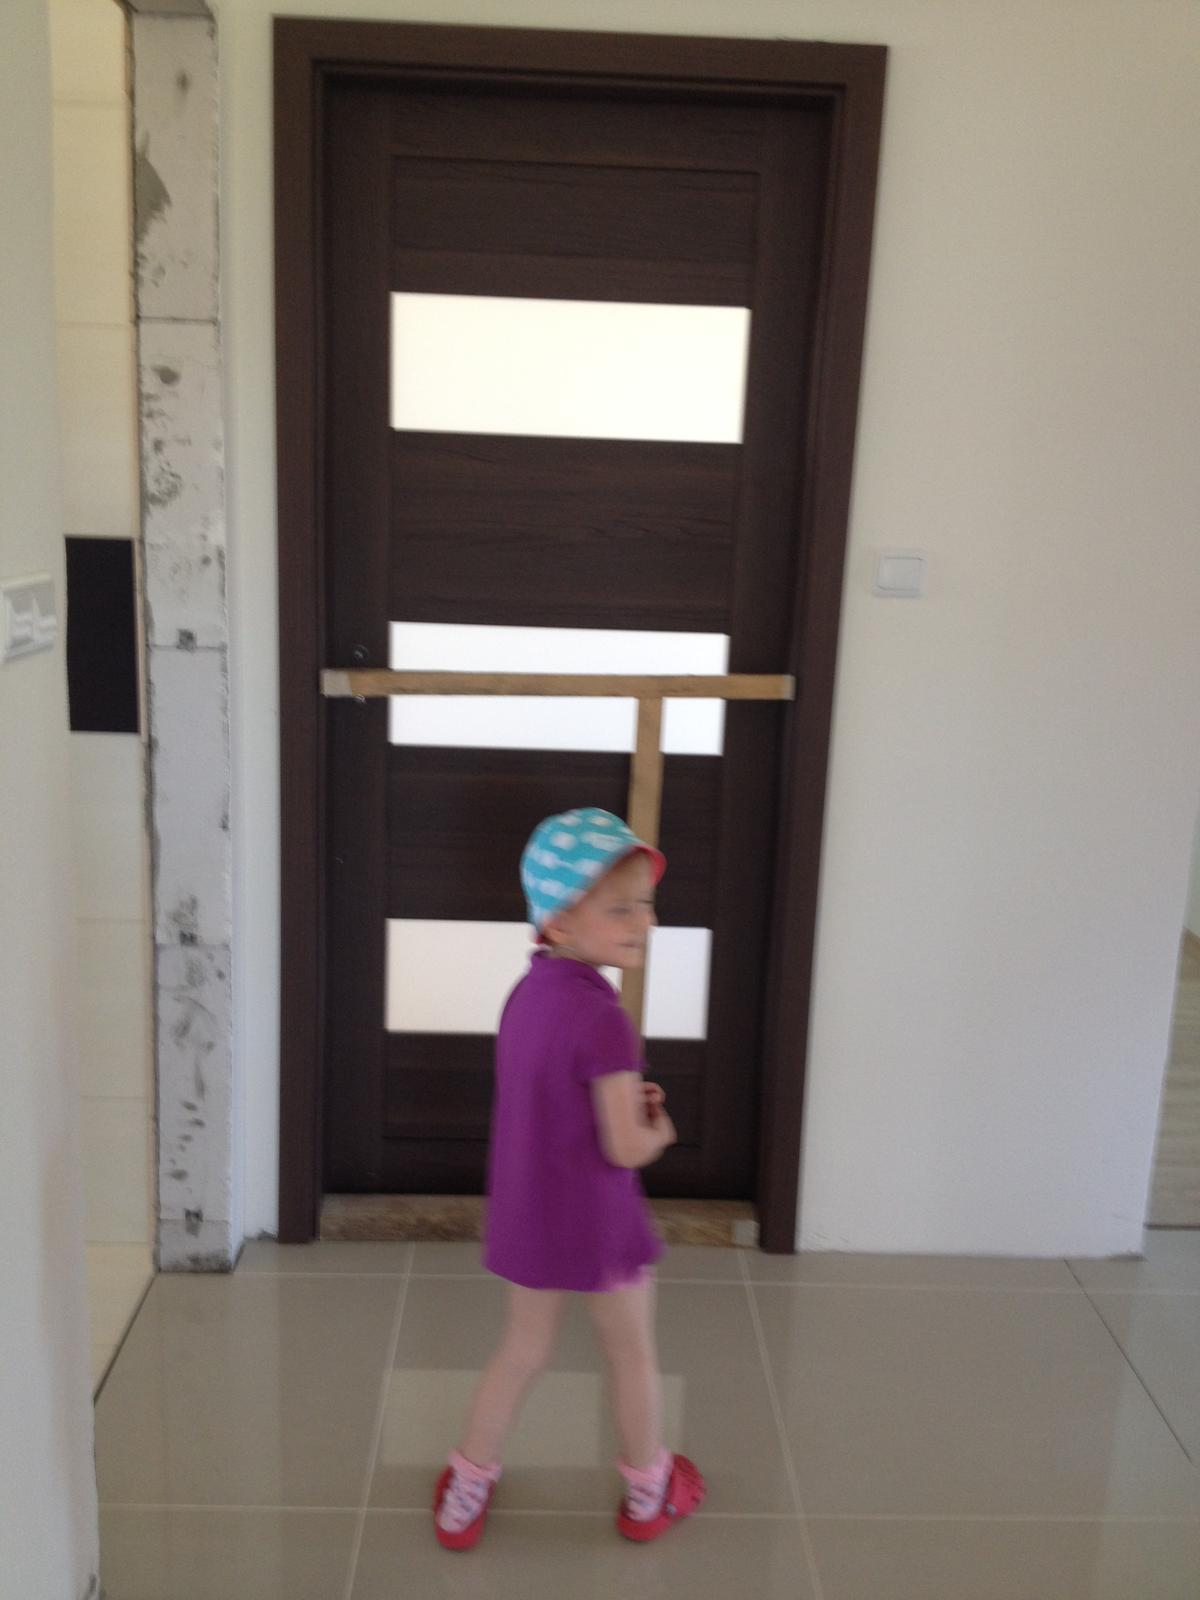 Bungalov 961 nas vysnivany domov :) - dvere sme takto robili:D